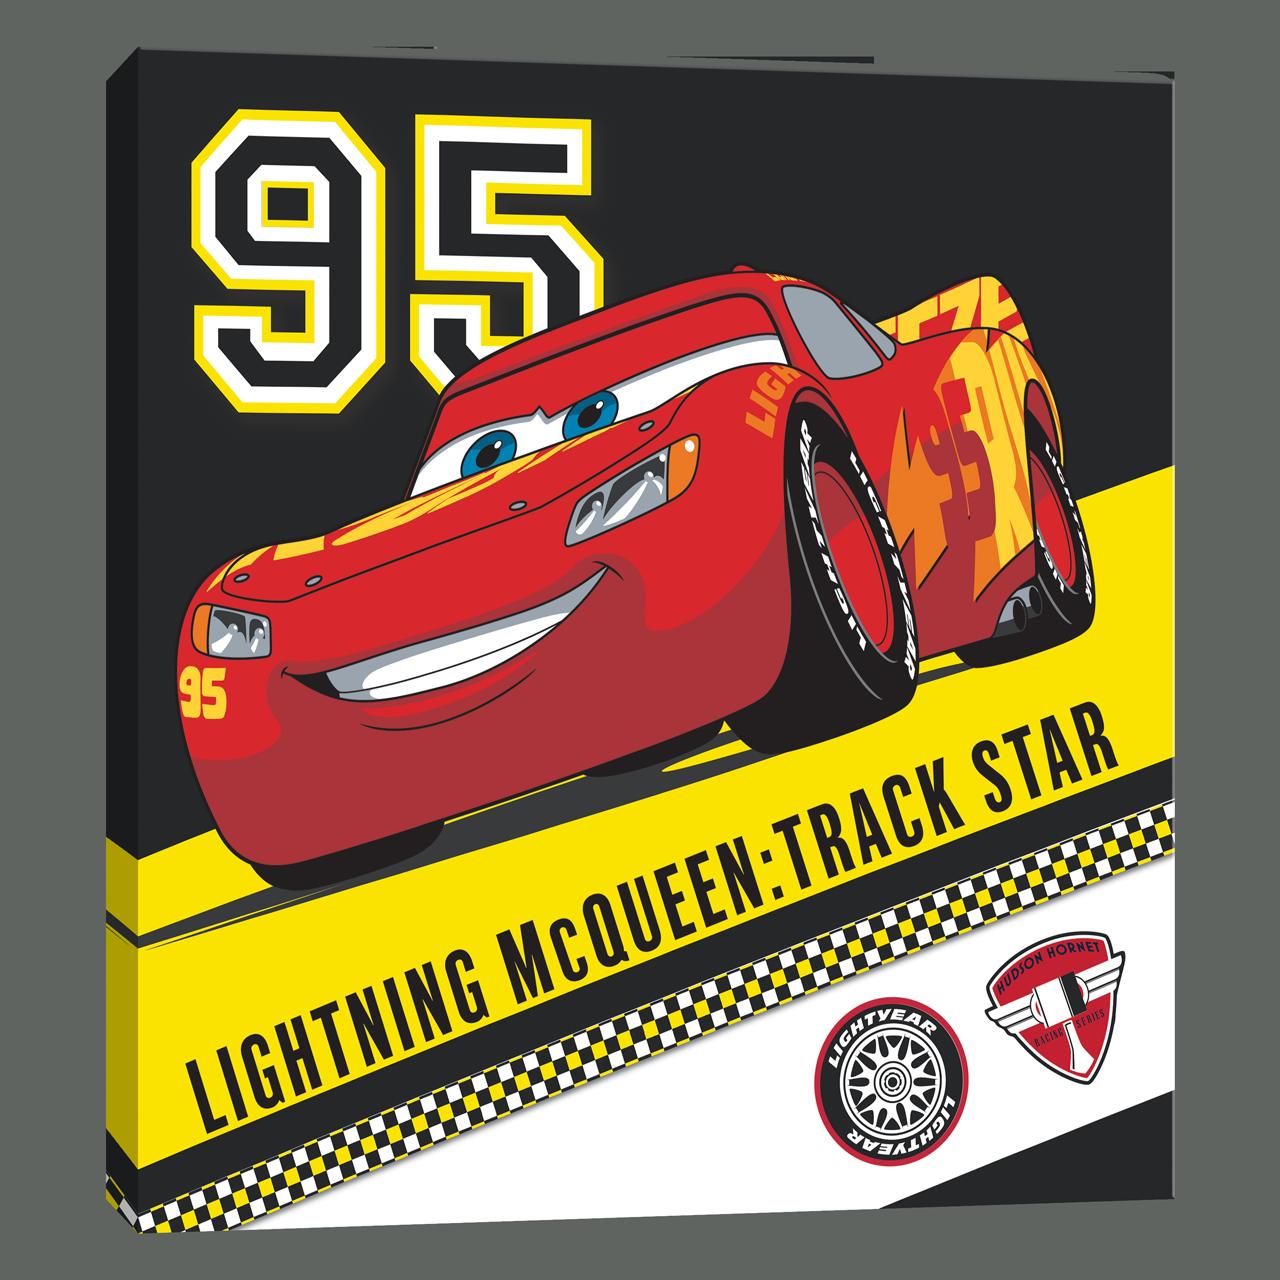 clip freeuse Mcqueen clipart tinkerbell movie. Lightning track star entertainart.